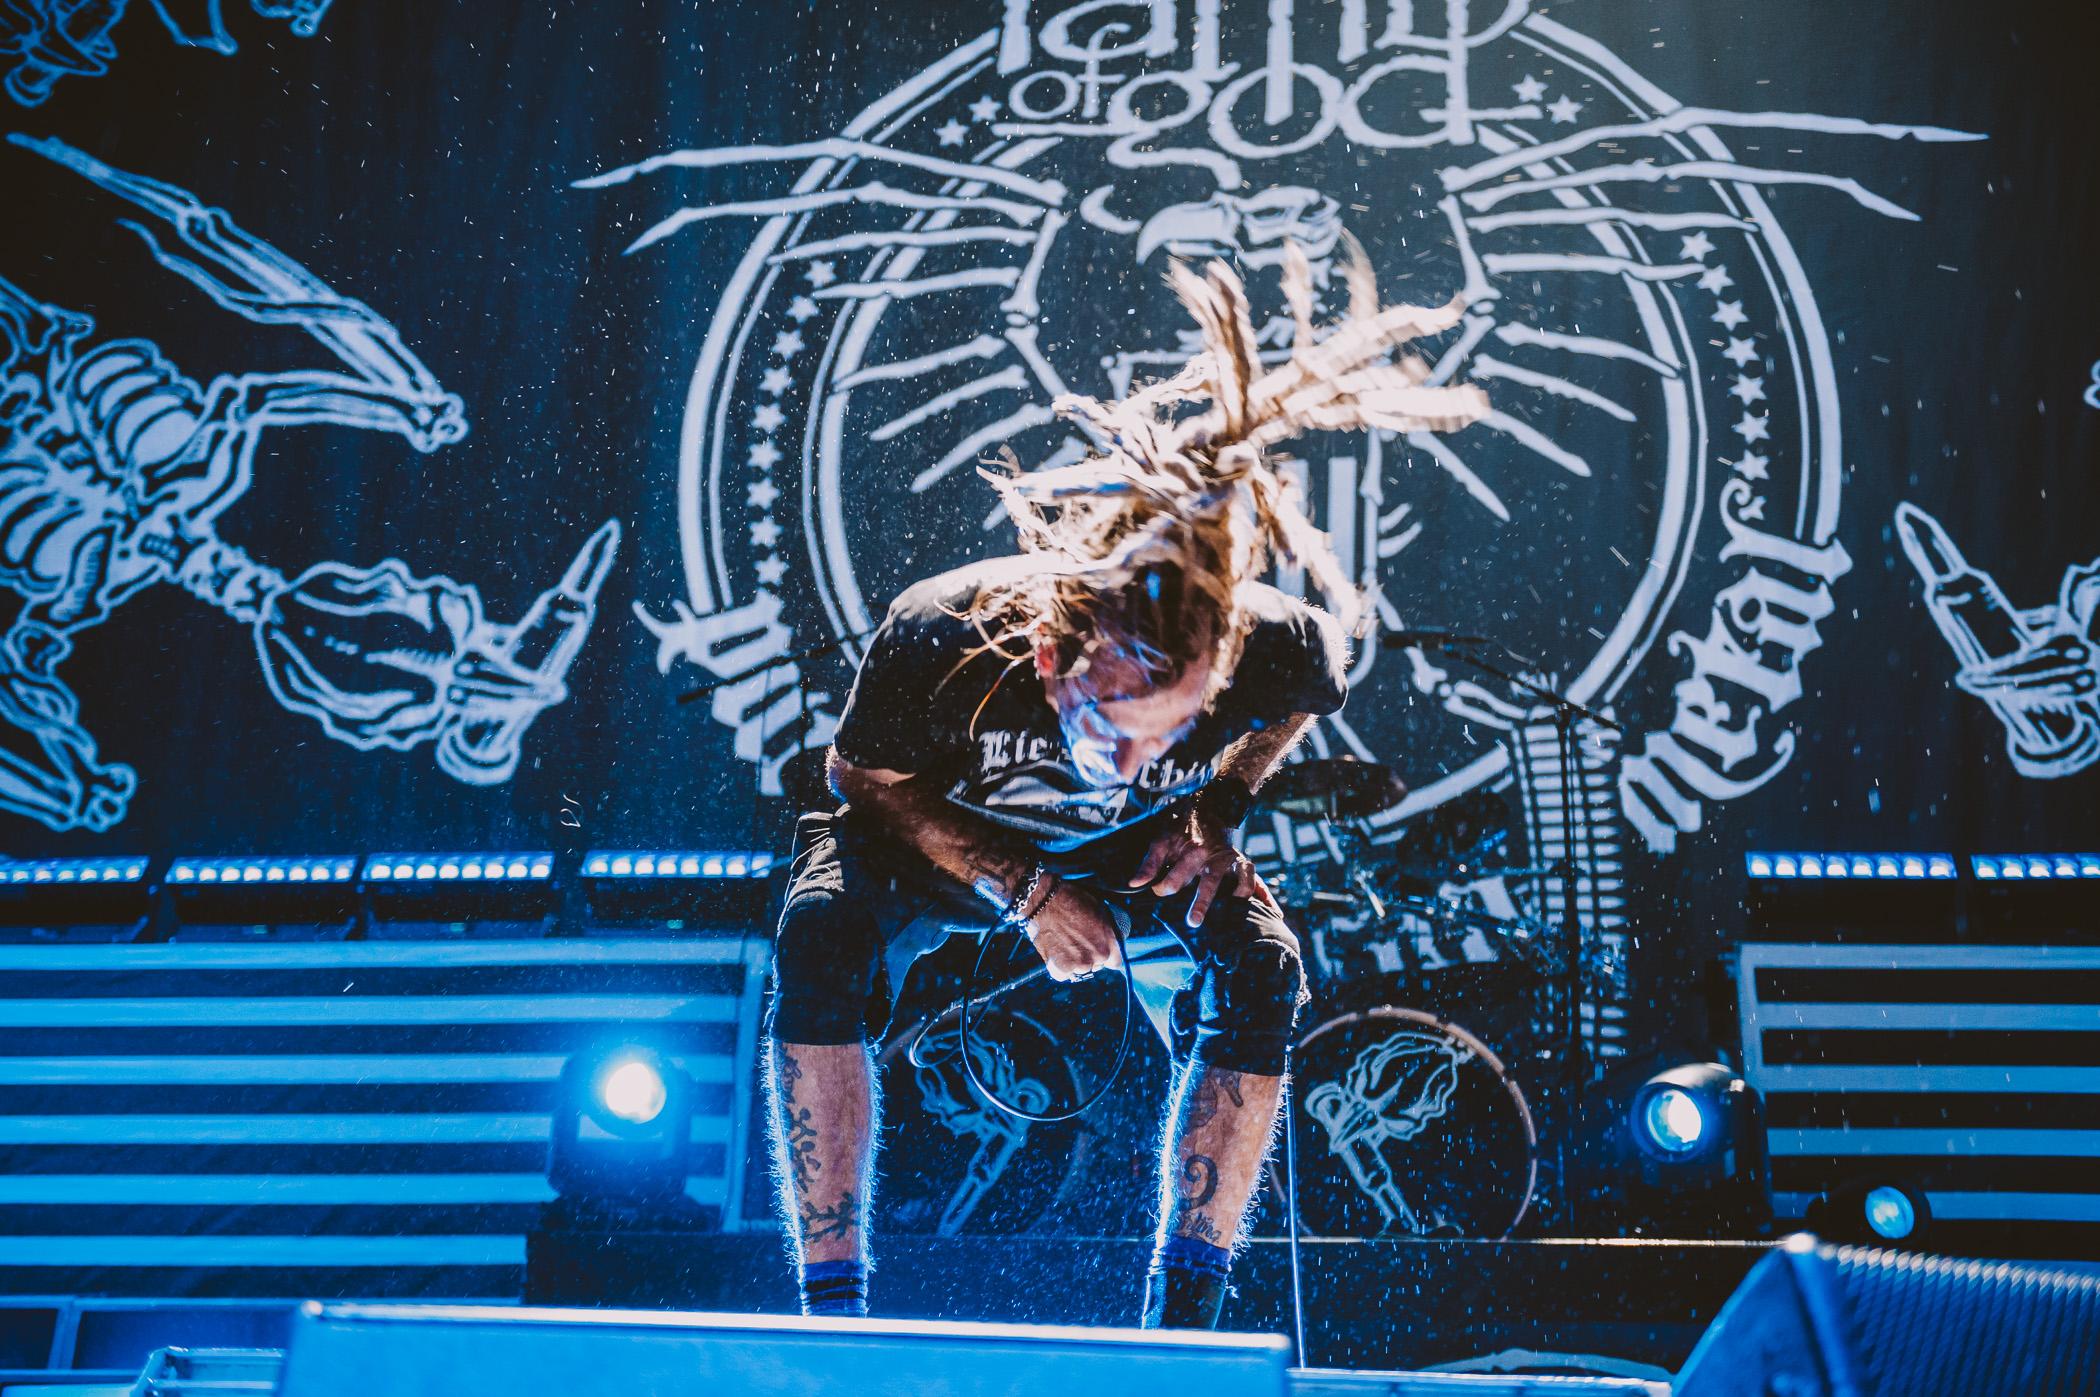 1_Lamb_Of_God-Pacific_Coliseum-Vancouver-Timothy_Nguyen-20180516 (19 of 47).jpg